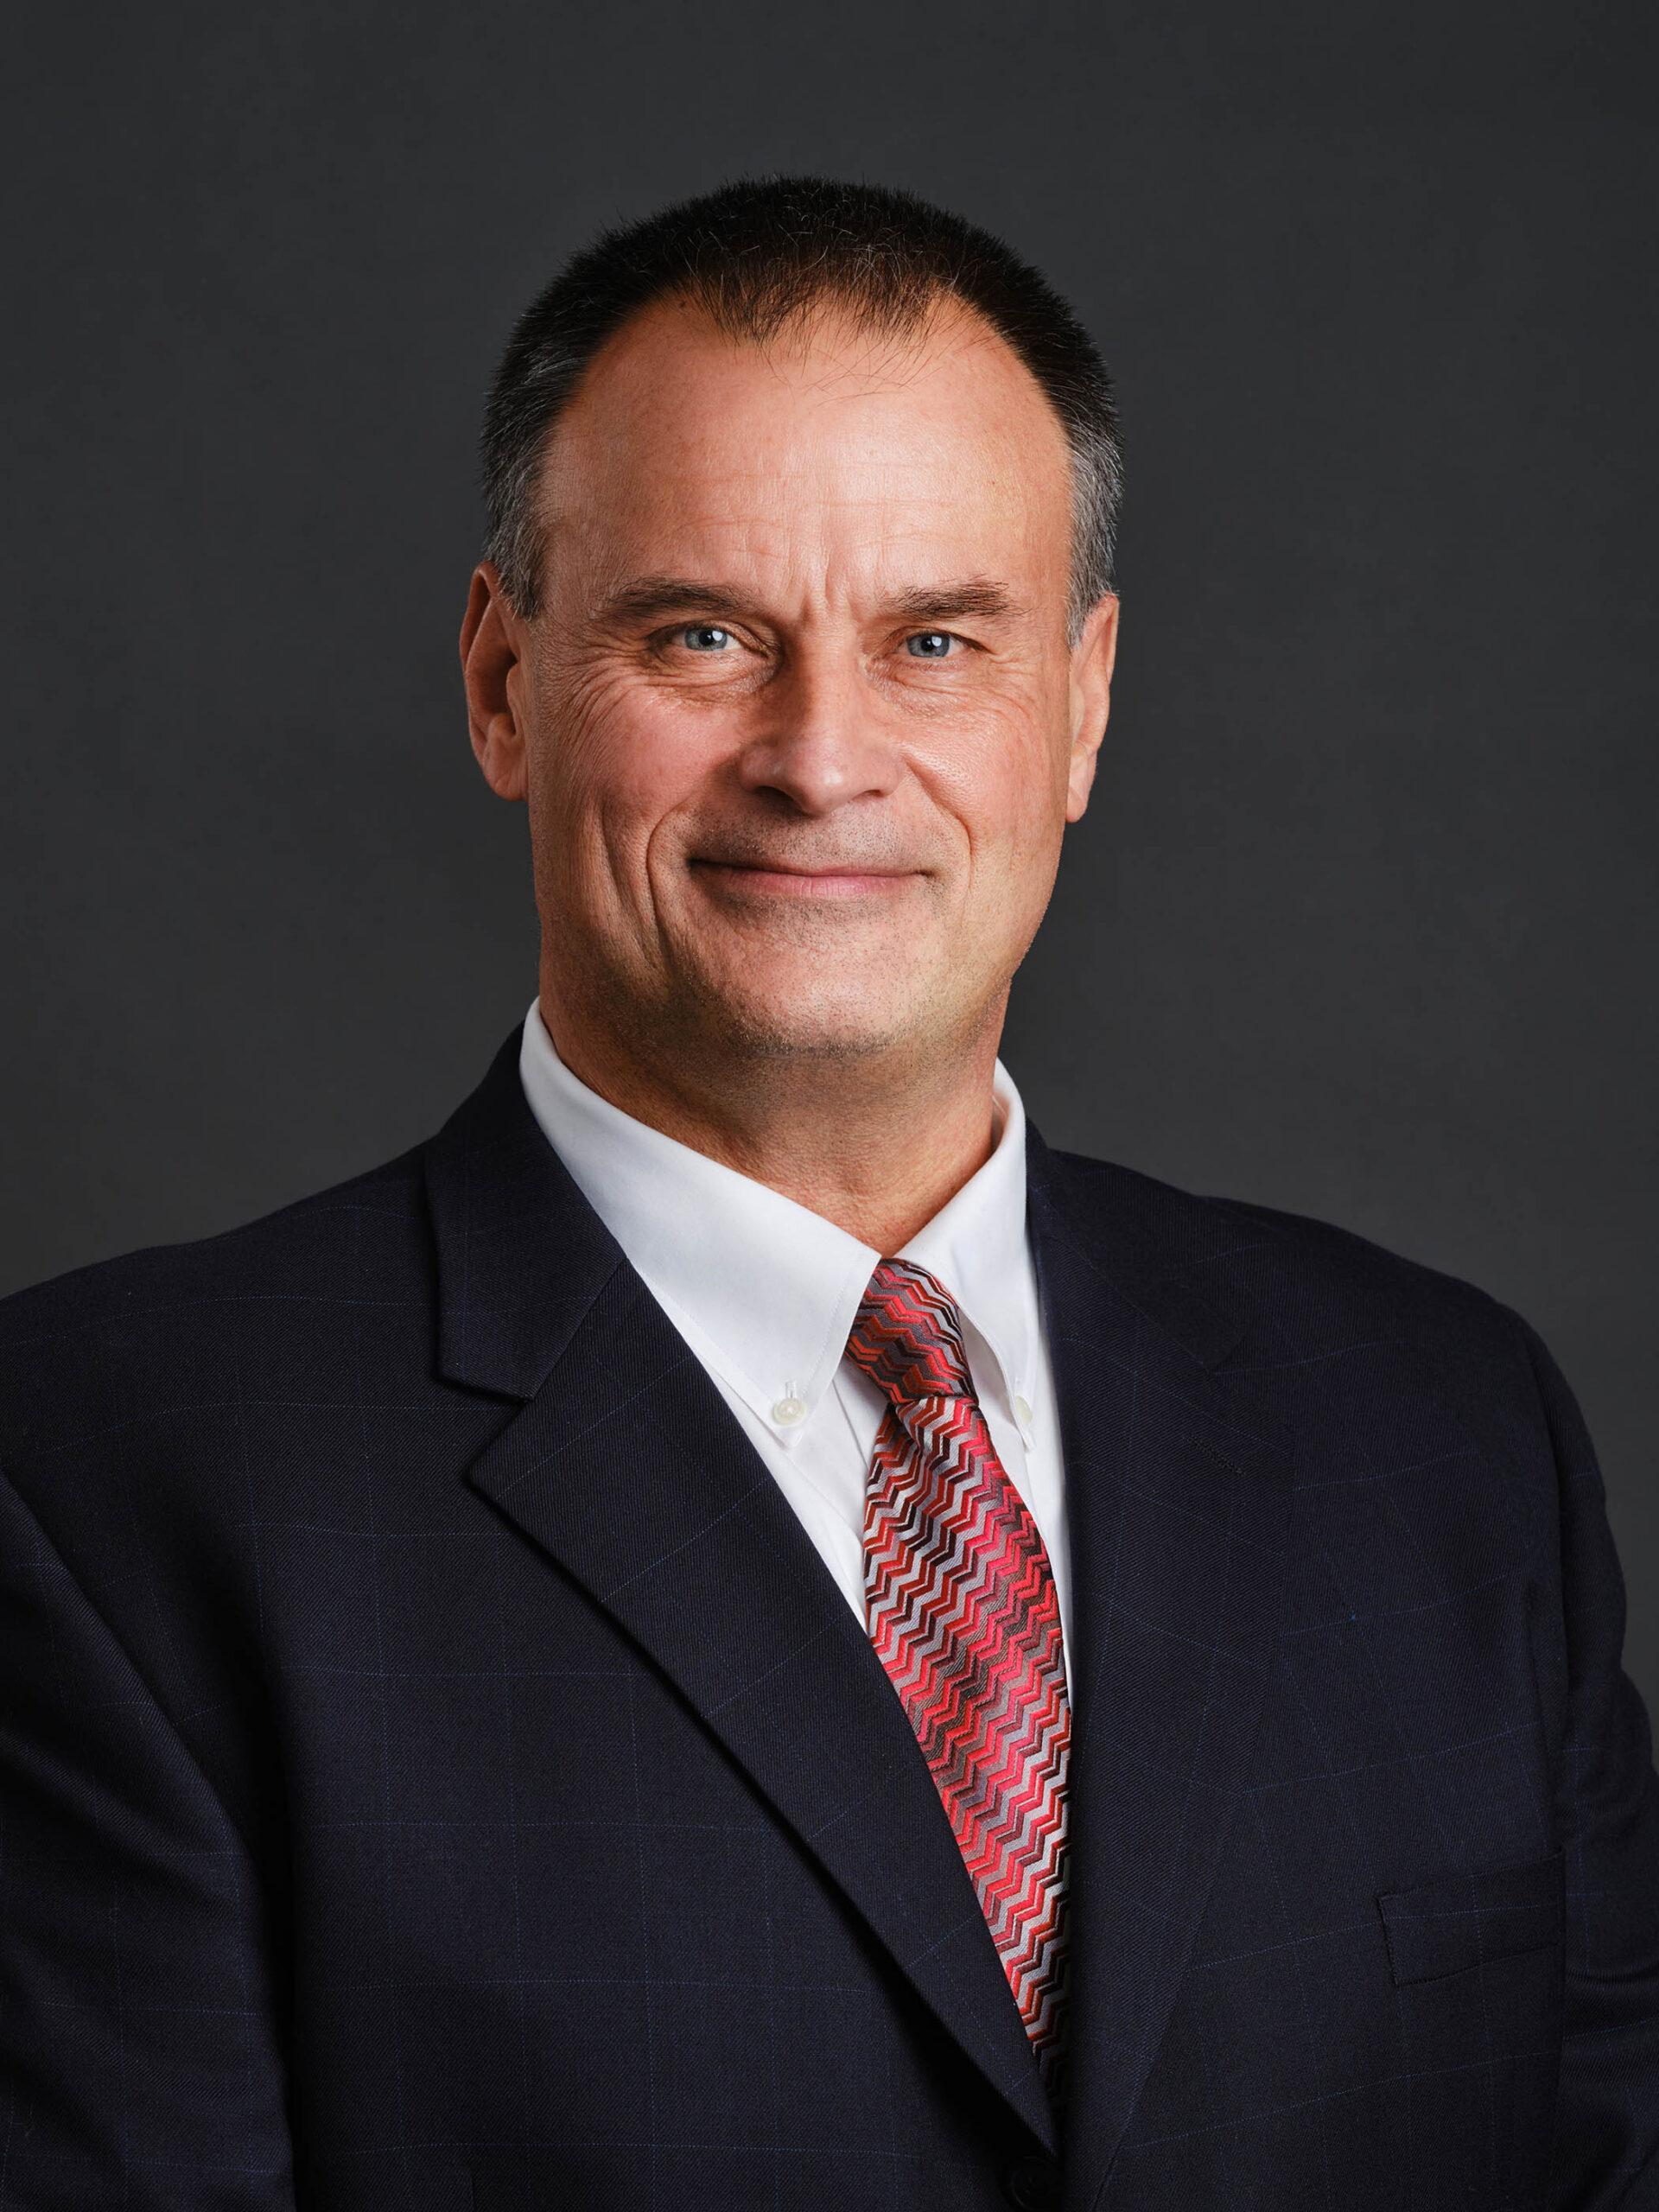 John Dubyk